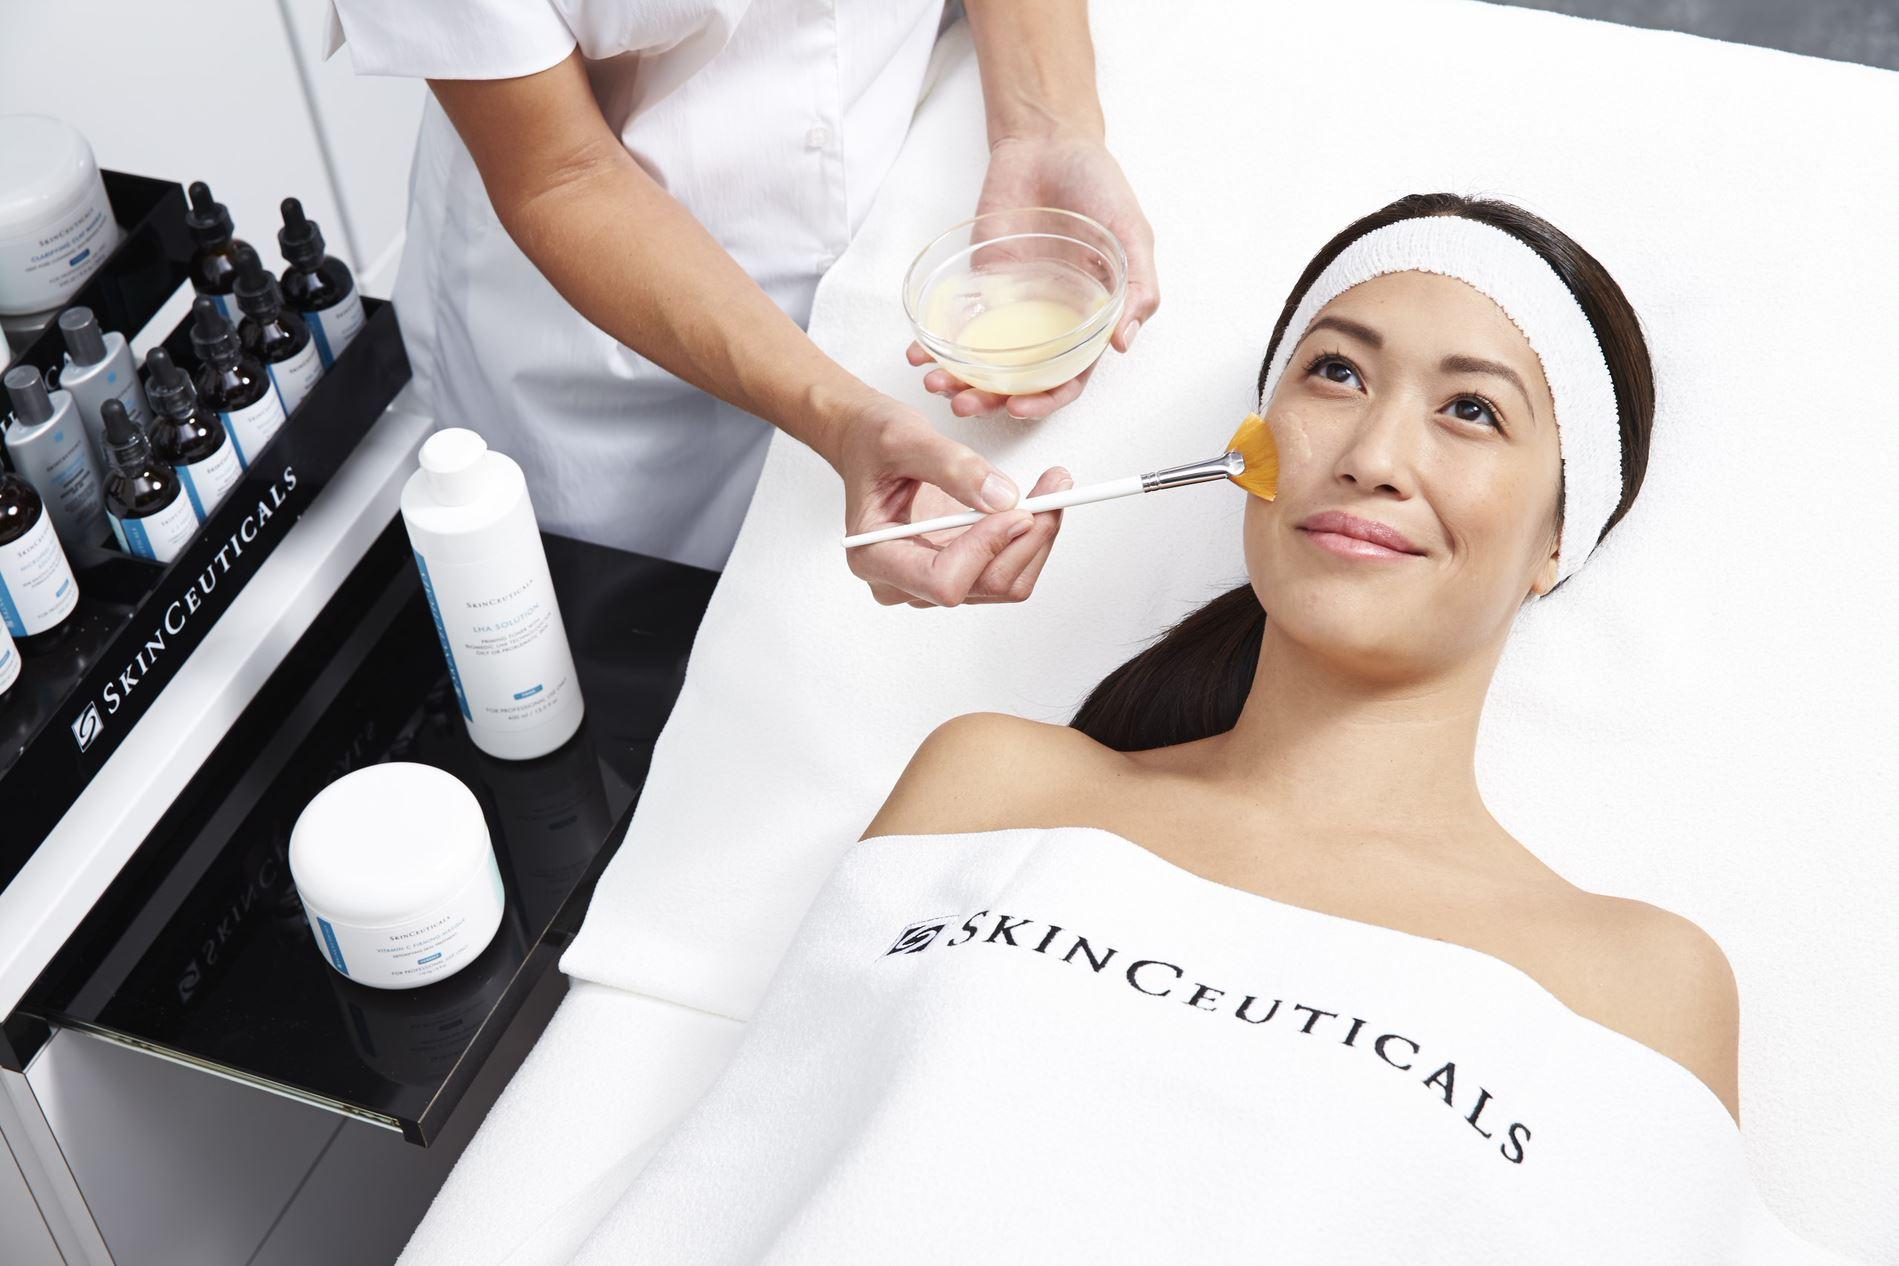 Skinceuticals zo skin health alumiermd Skin Cosmetics London